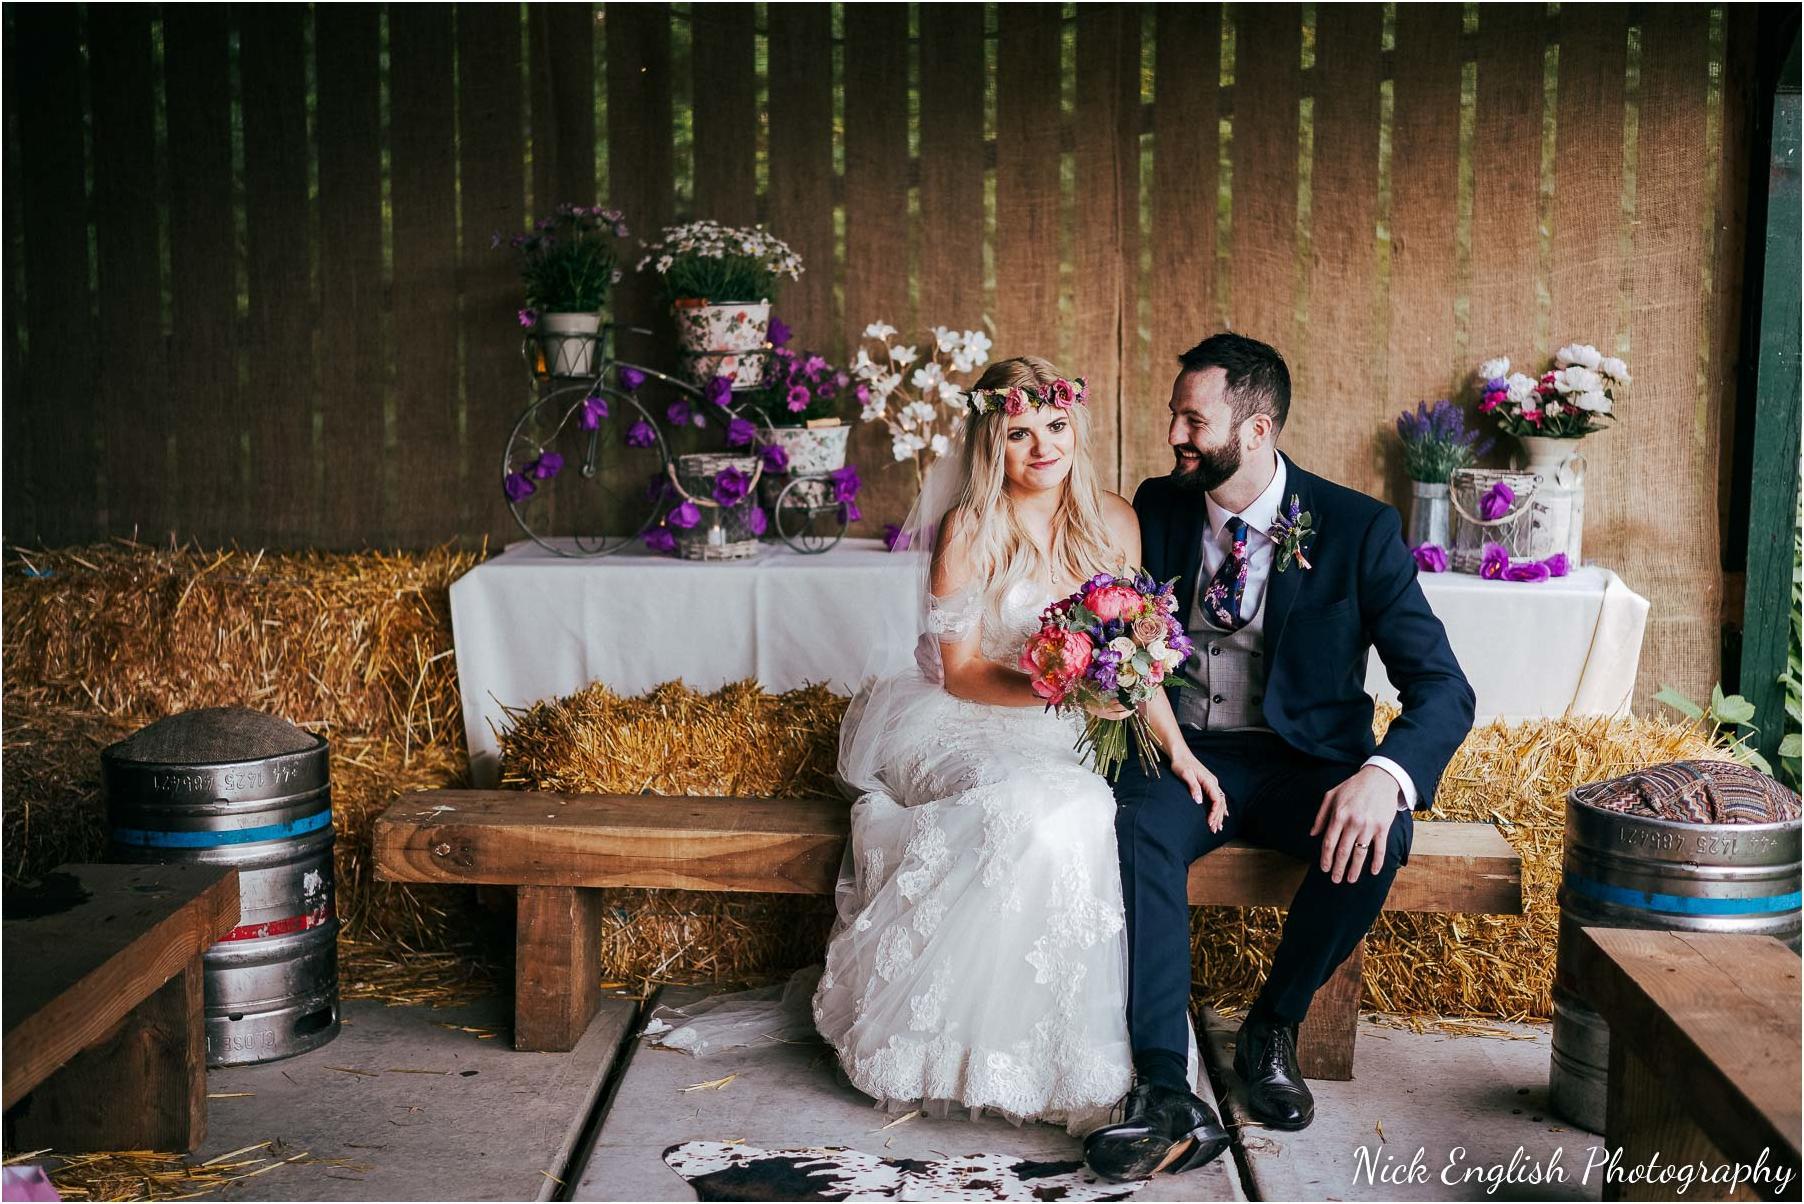 Whitebottom_Farm_Wedding_Manchester_Photograph-66.jpg